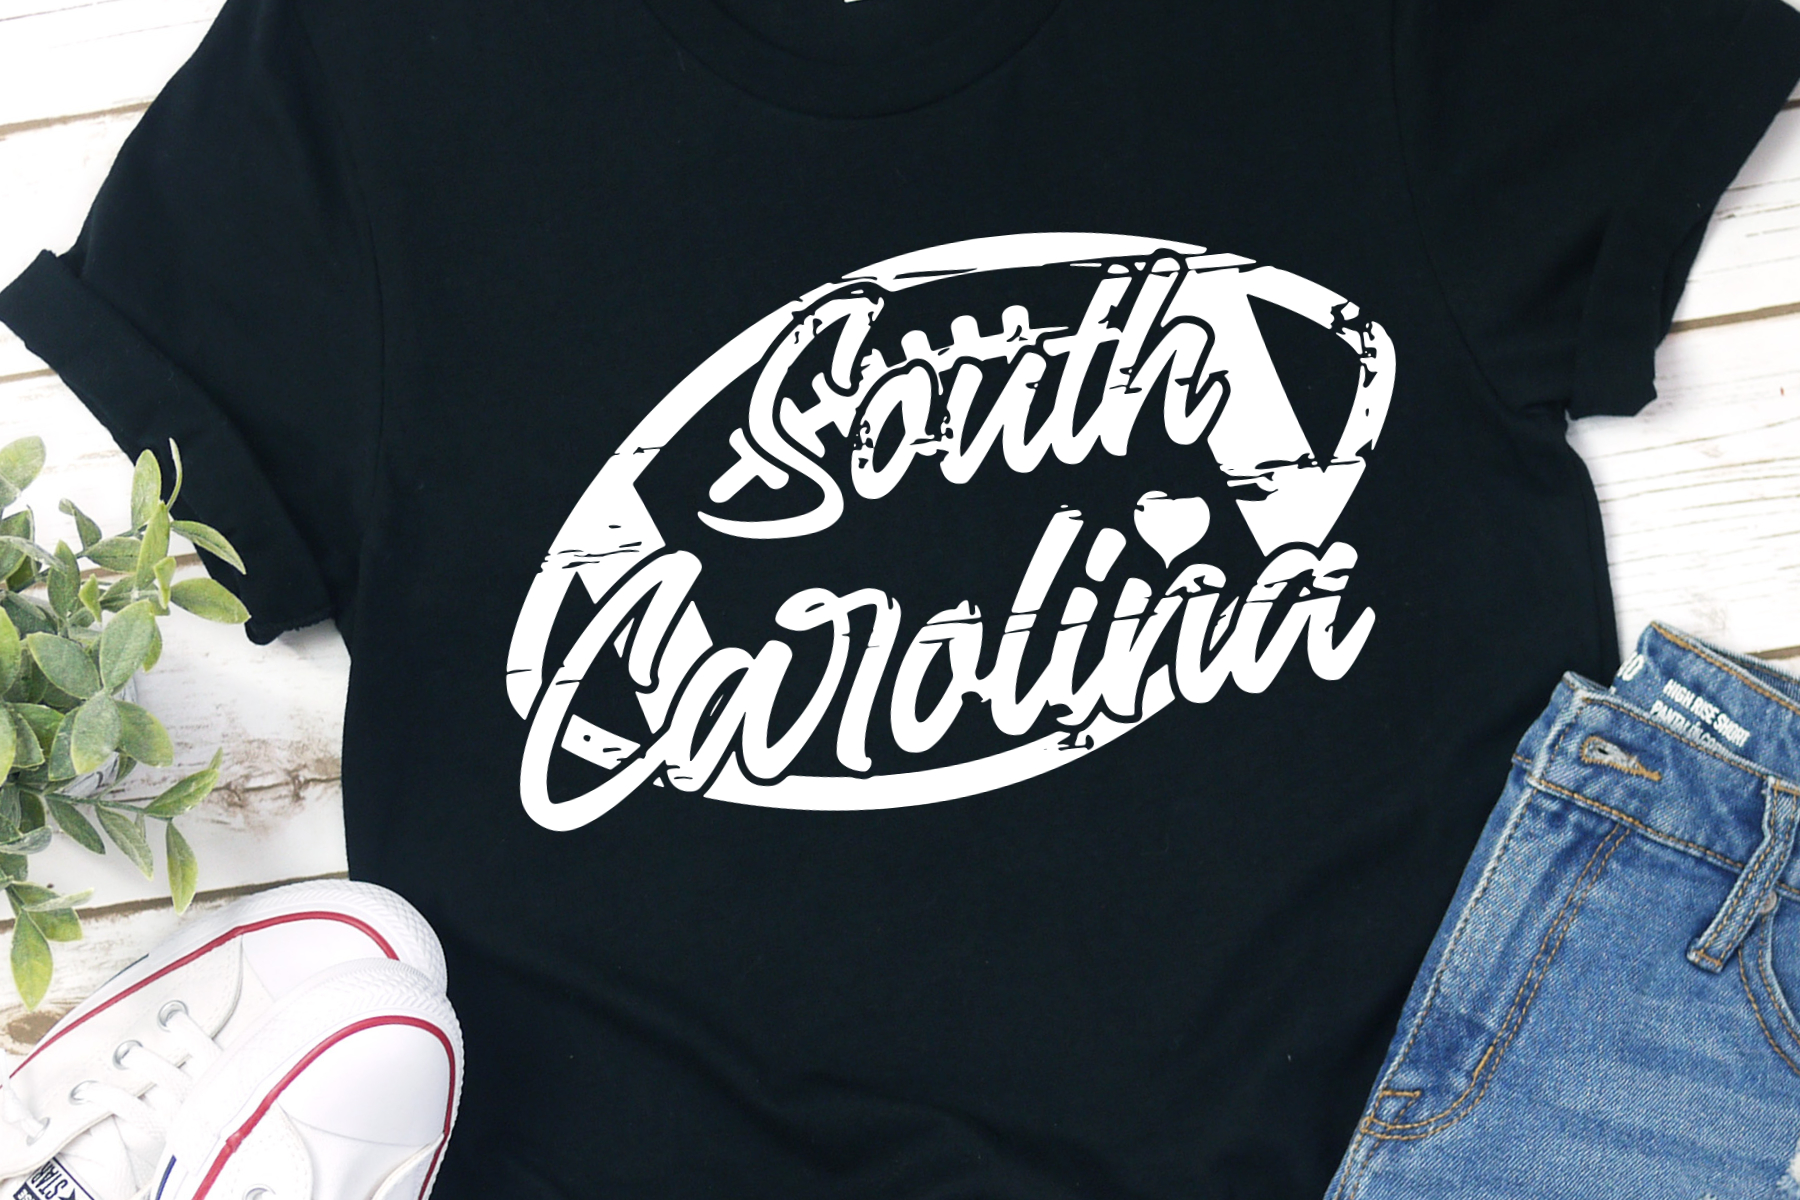 South Carolina Football Grunge Distressed Football SVG example image 1